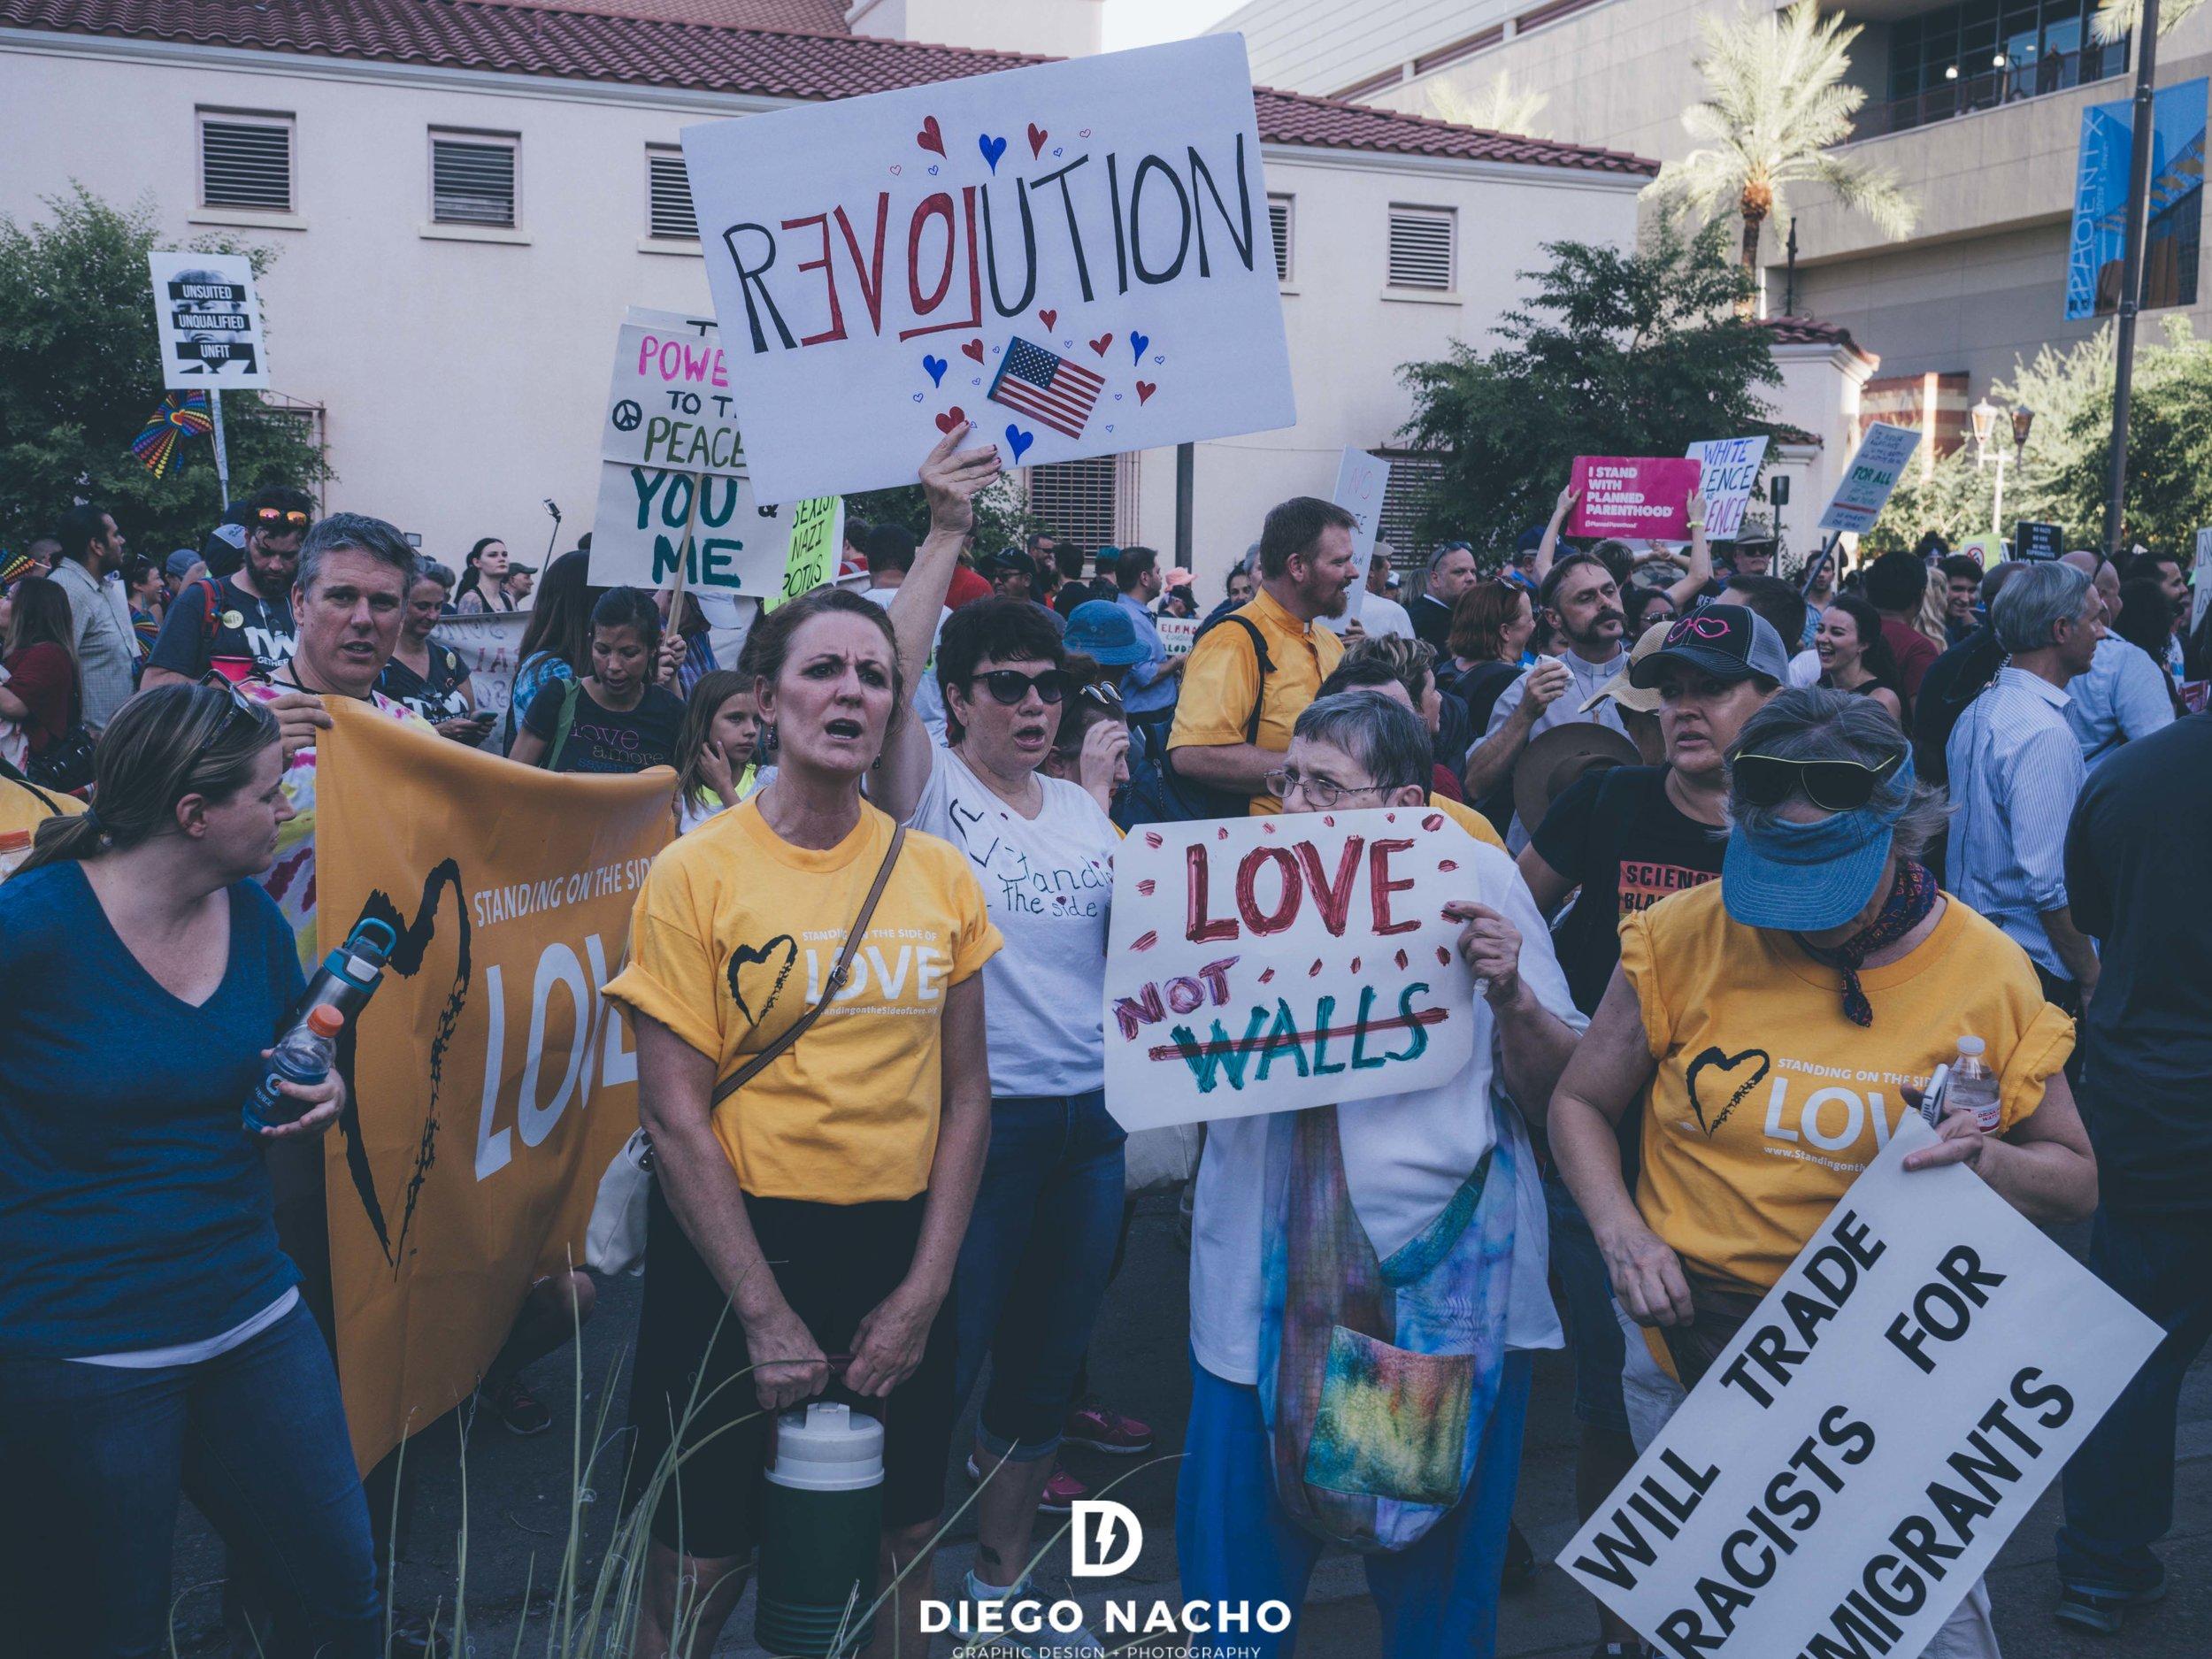 08-22-2017 Phoenix Trump Rally 2017_1241.jpg